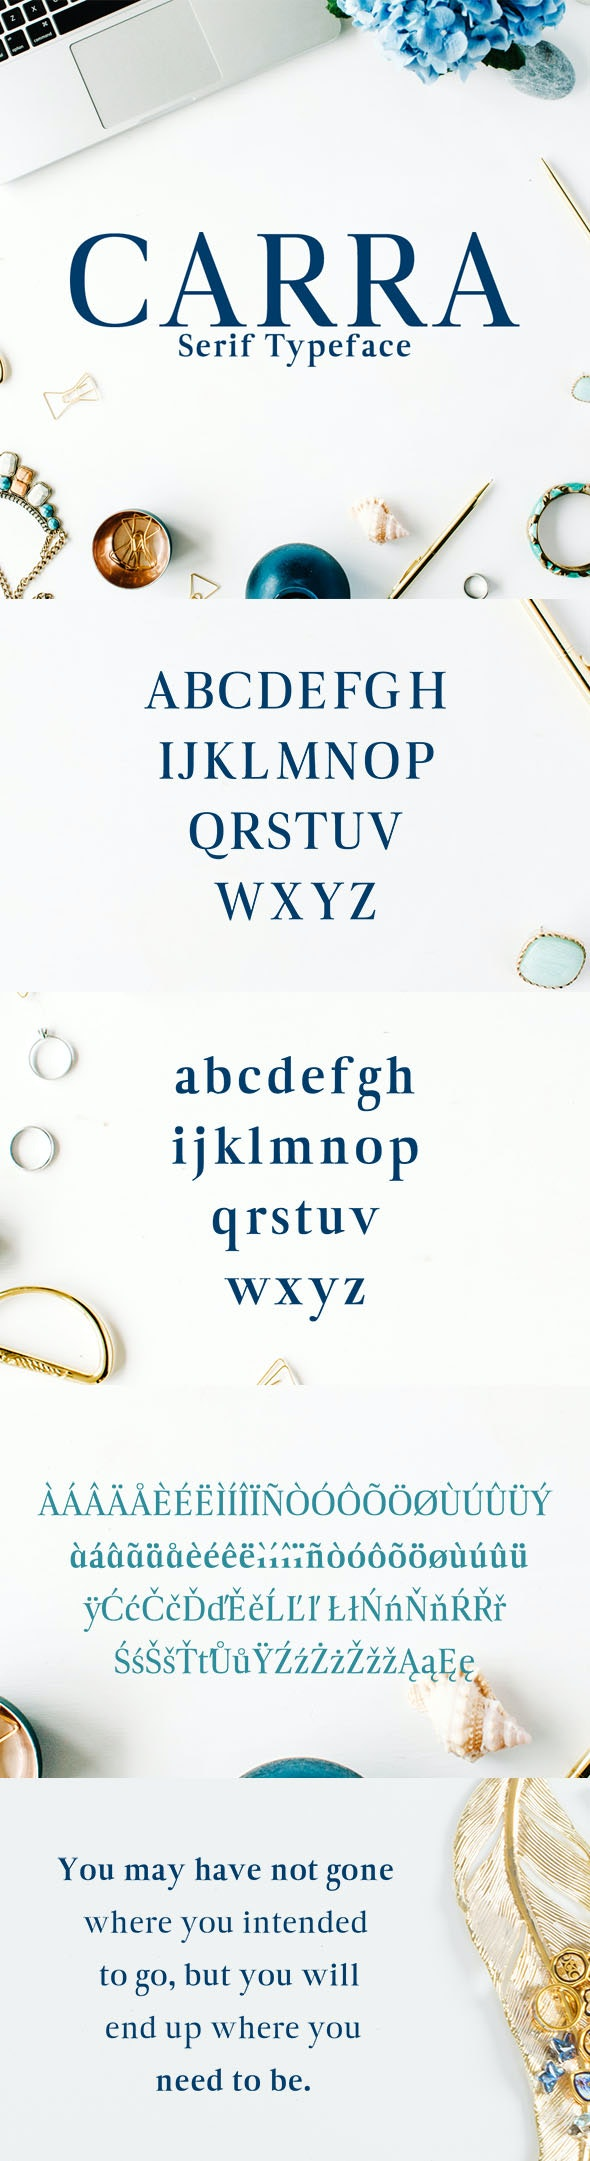 Carra Serif Typeface - Serif Fonts